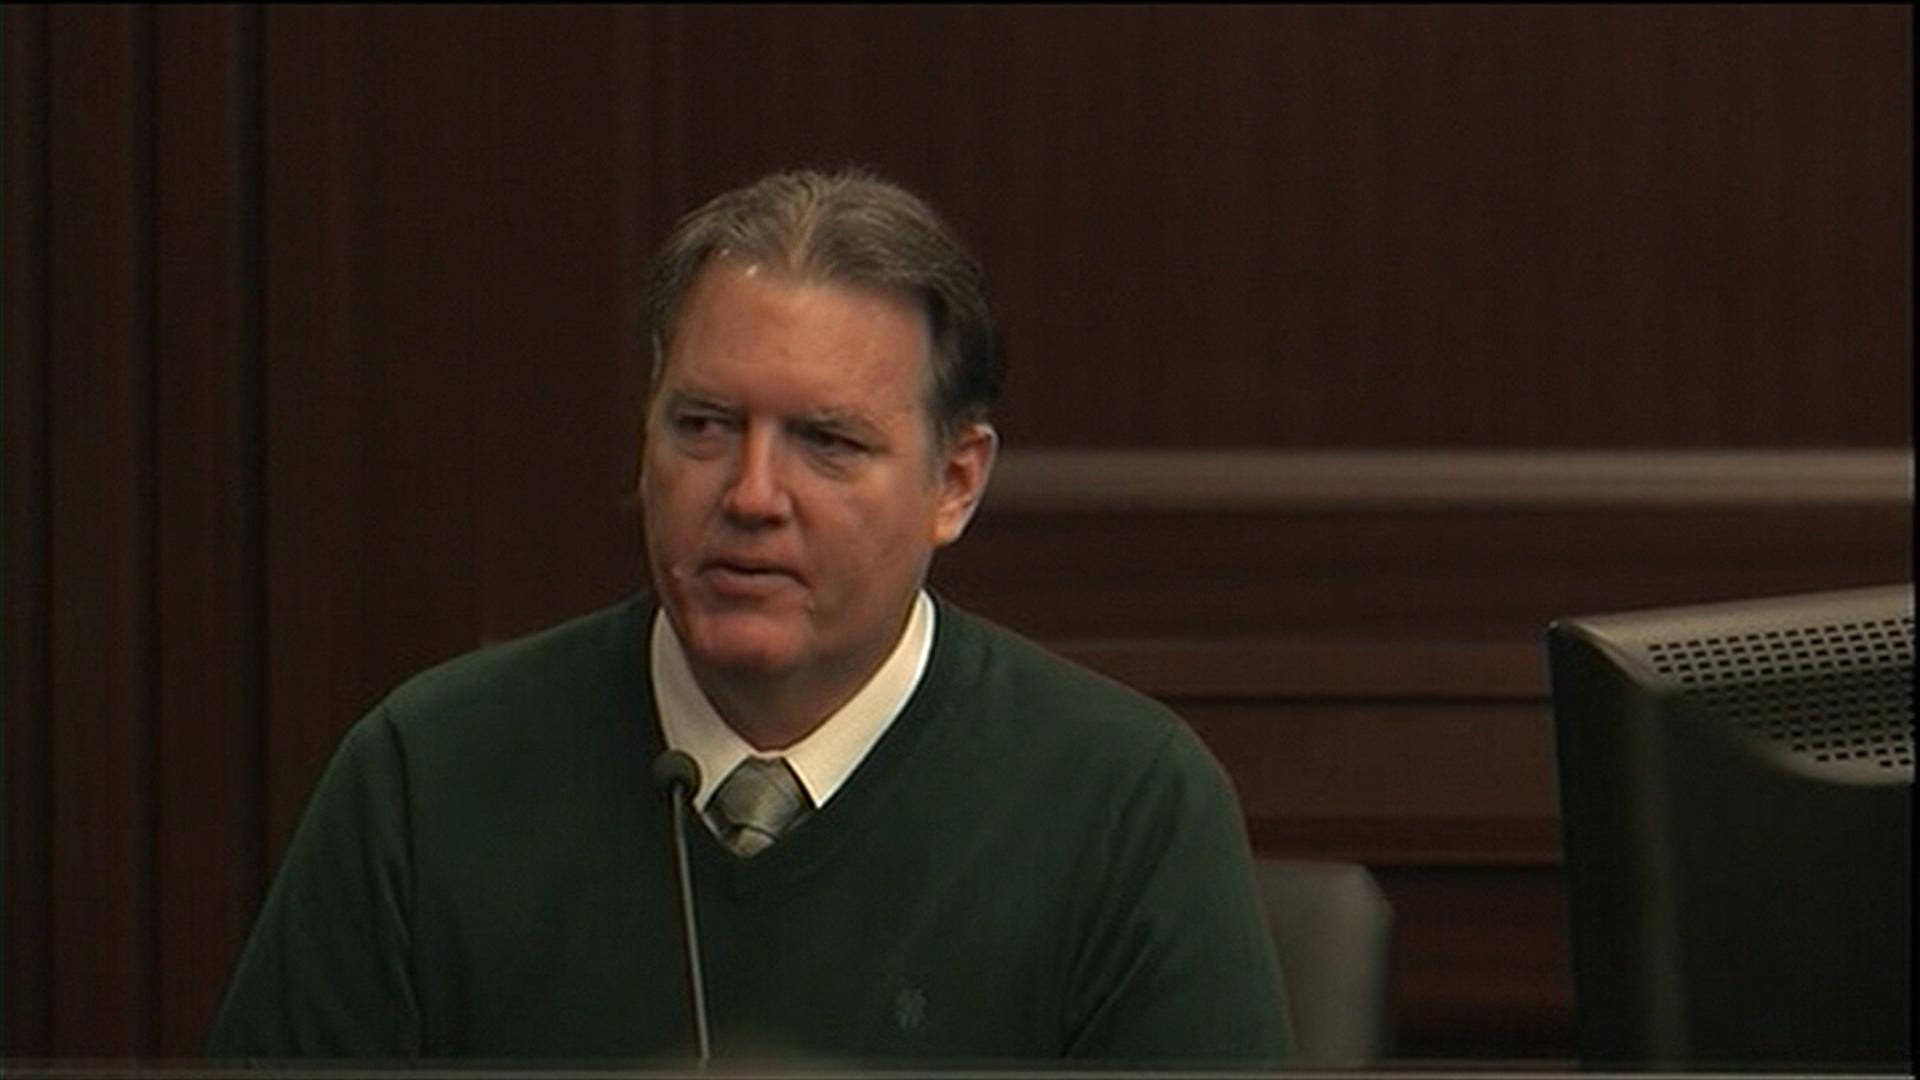 New details on Michael Dunn retrial